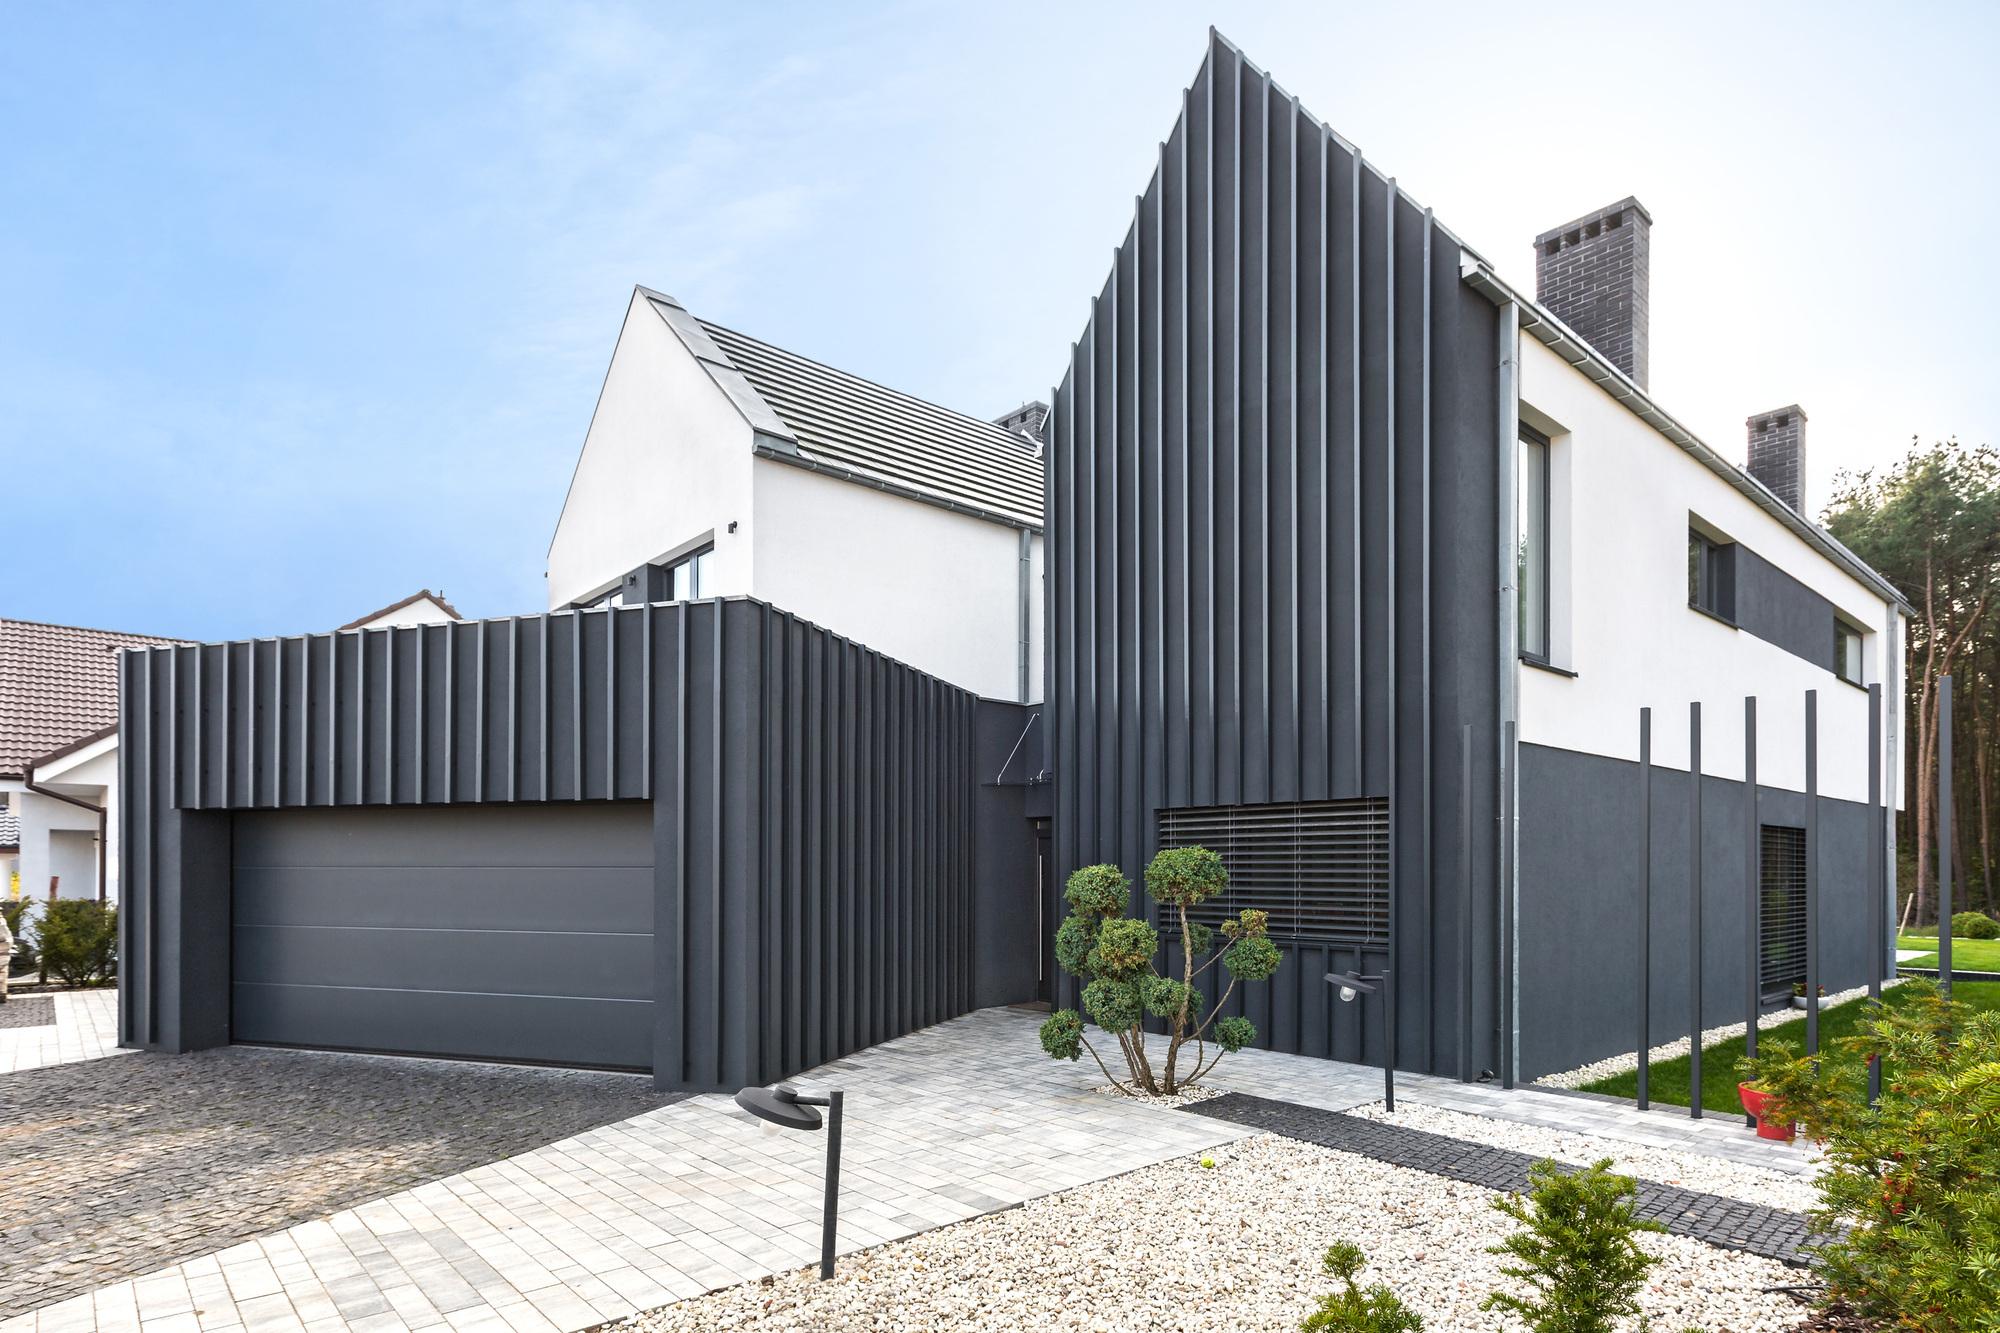 Fence house modelina architekci archdaily